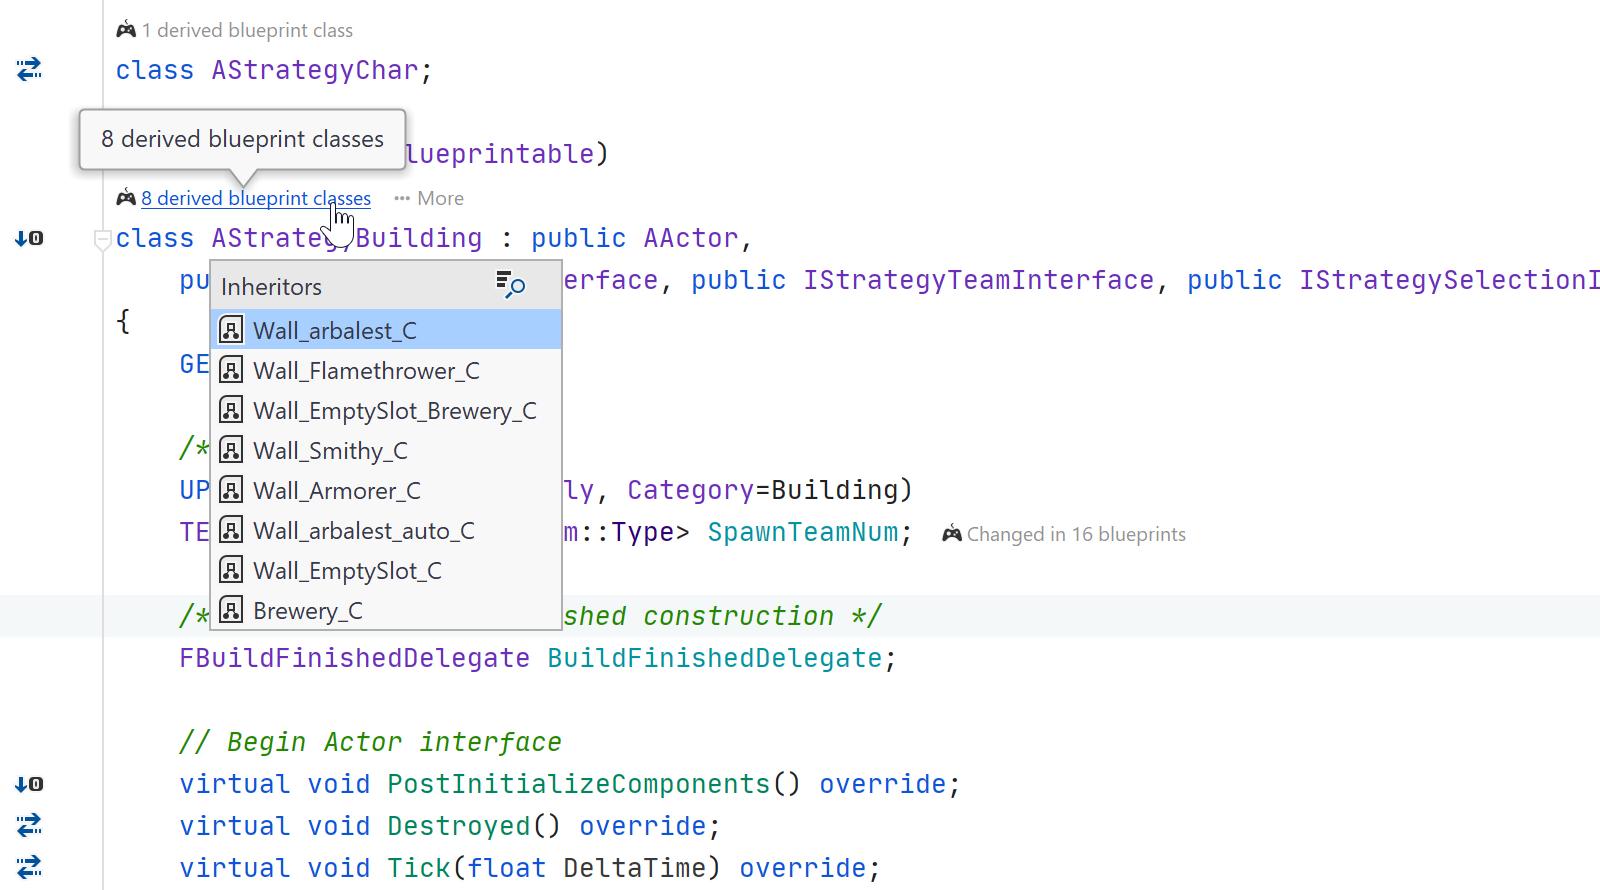 JetBrains Rider: Derived blueprint classes